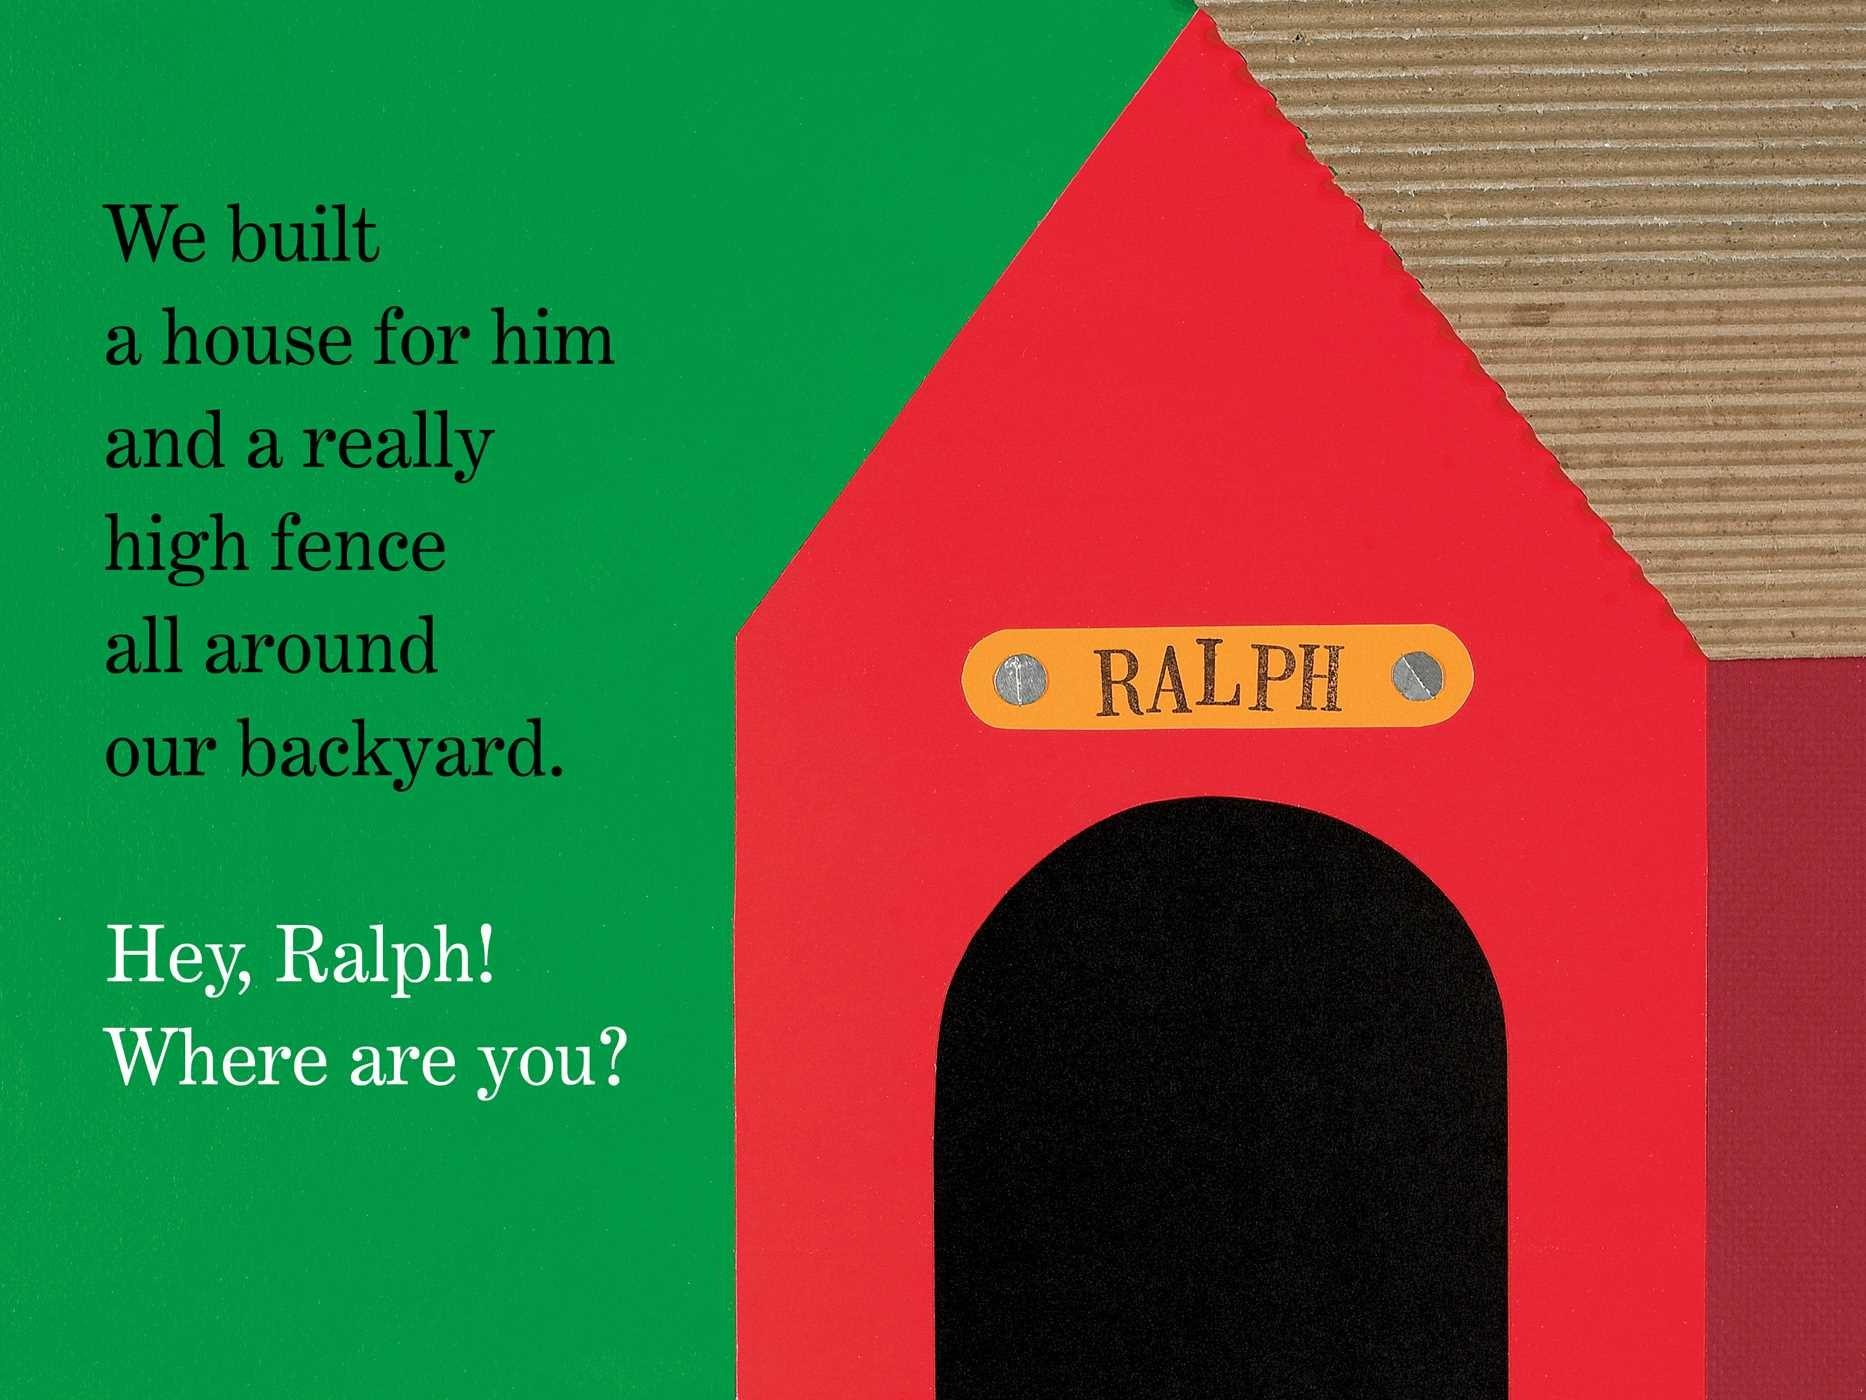 Rrralph 9781481452113.in02